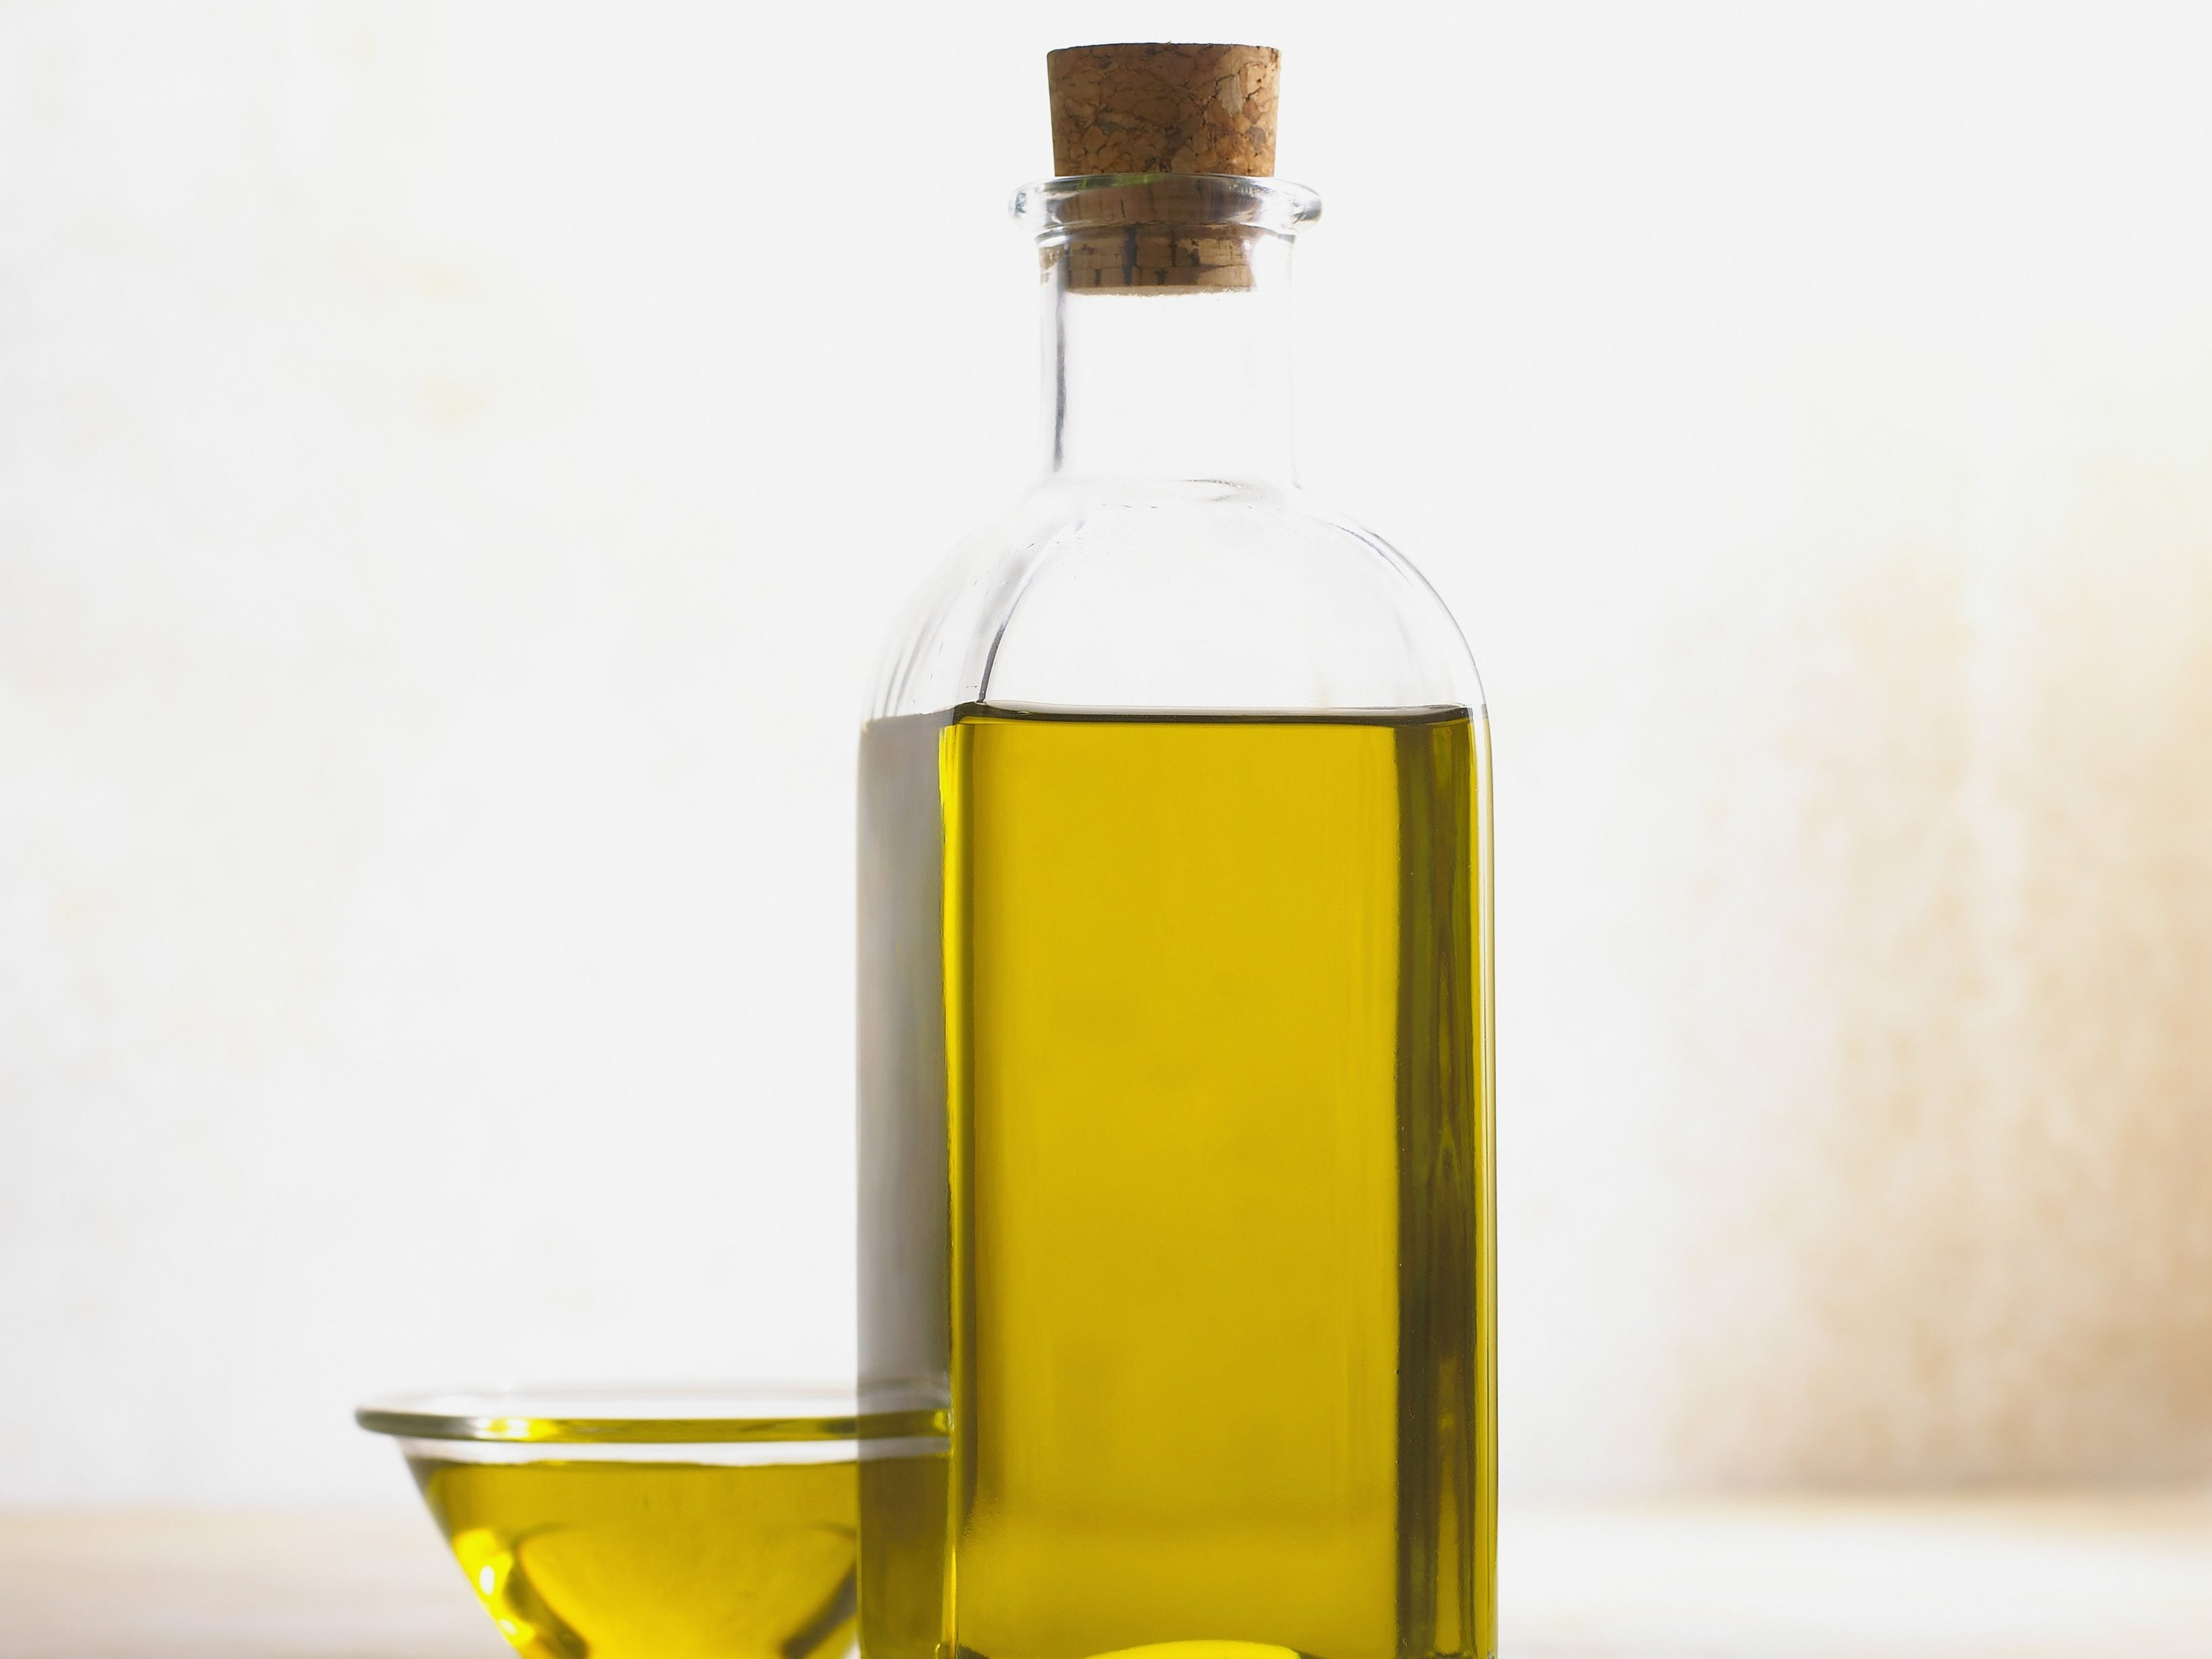 Olivenöl zum Locken pflegen